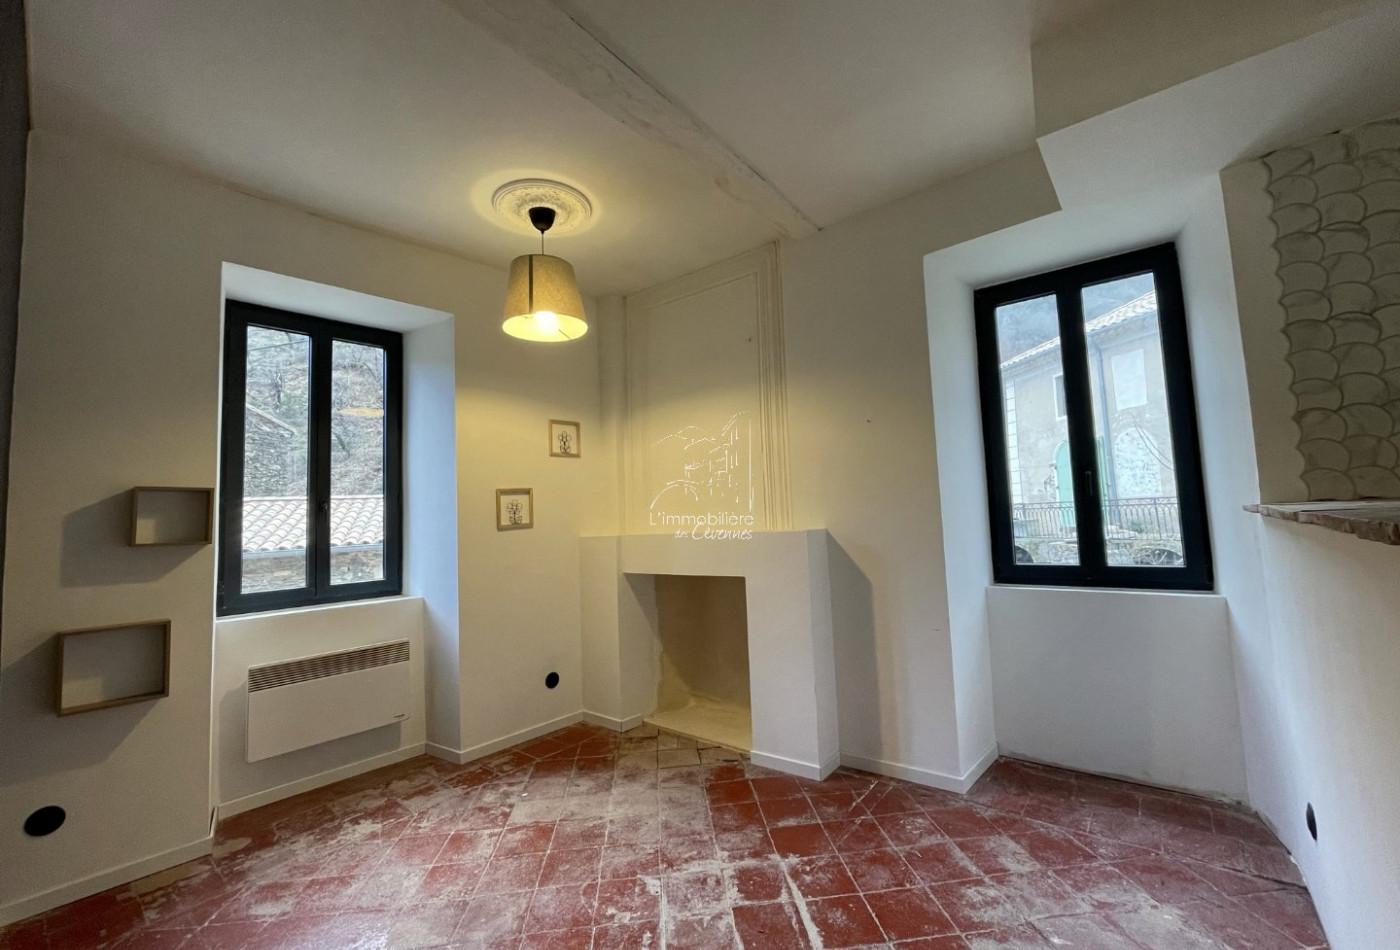 A vendre  Valleraugue | Réf 340292480 - Immo3d